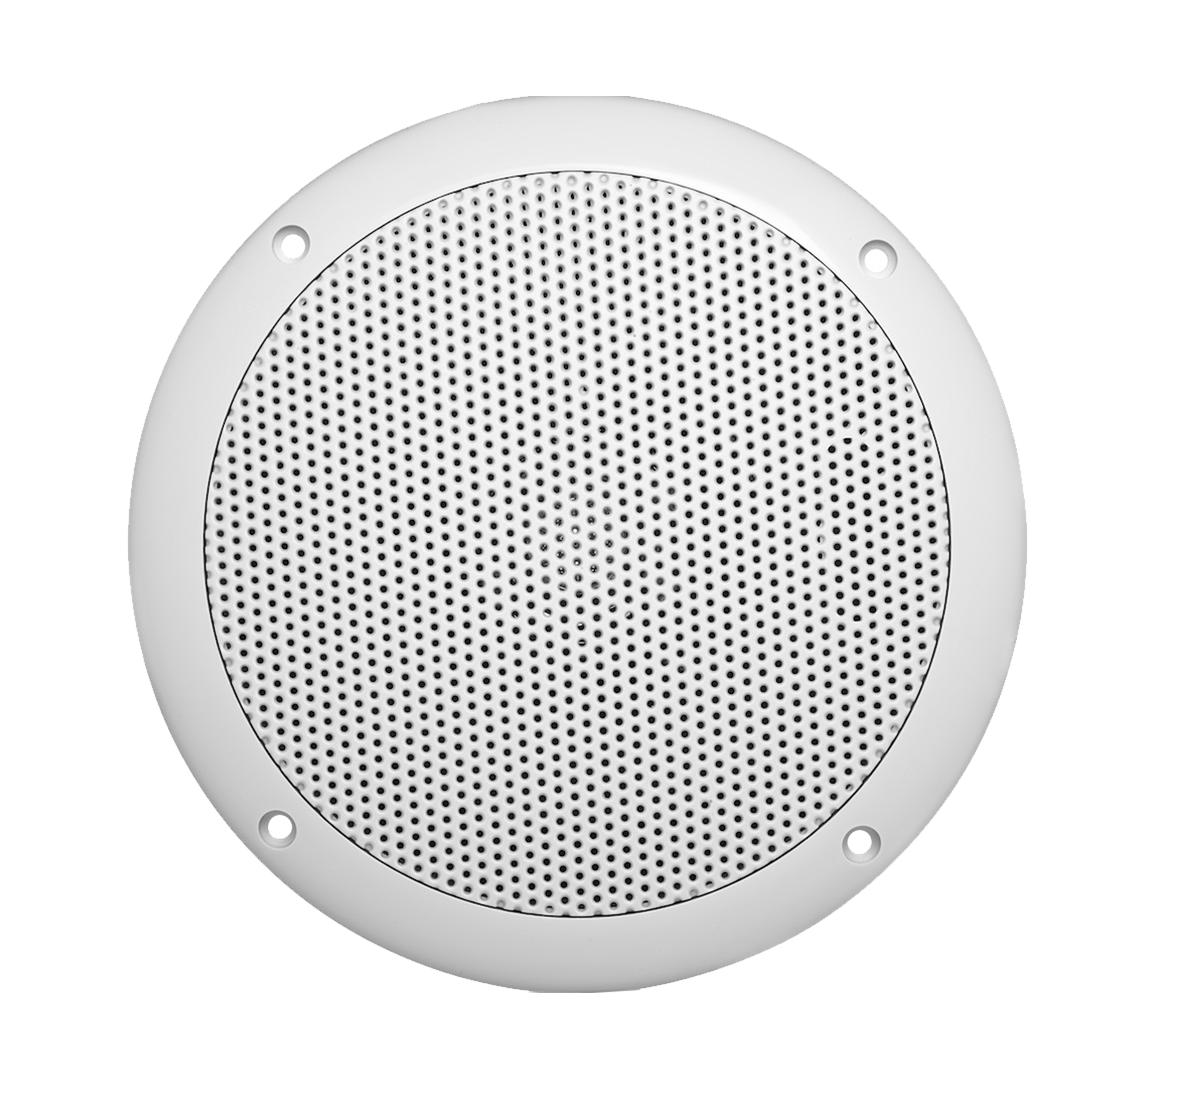 Artsound MDC64 6.5'' Waterproof Speakers Round (pair)